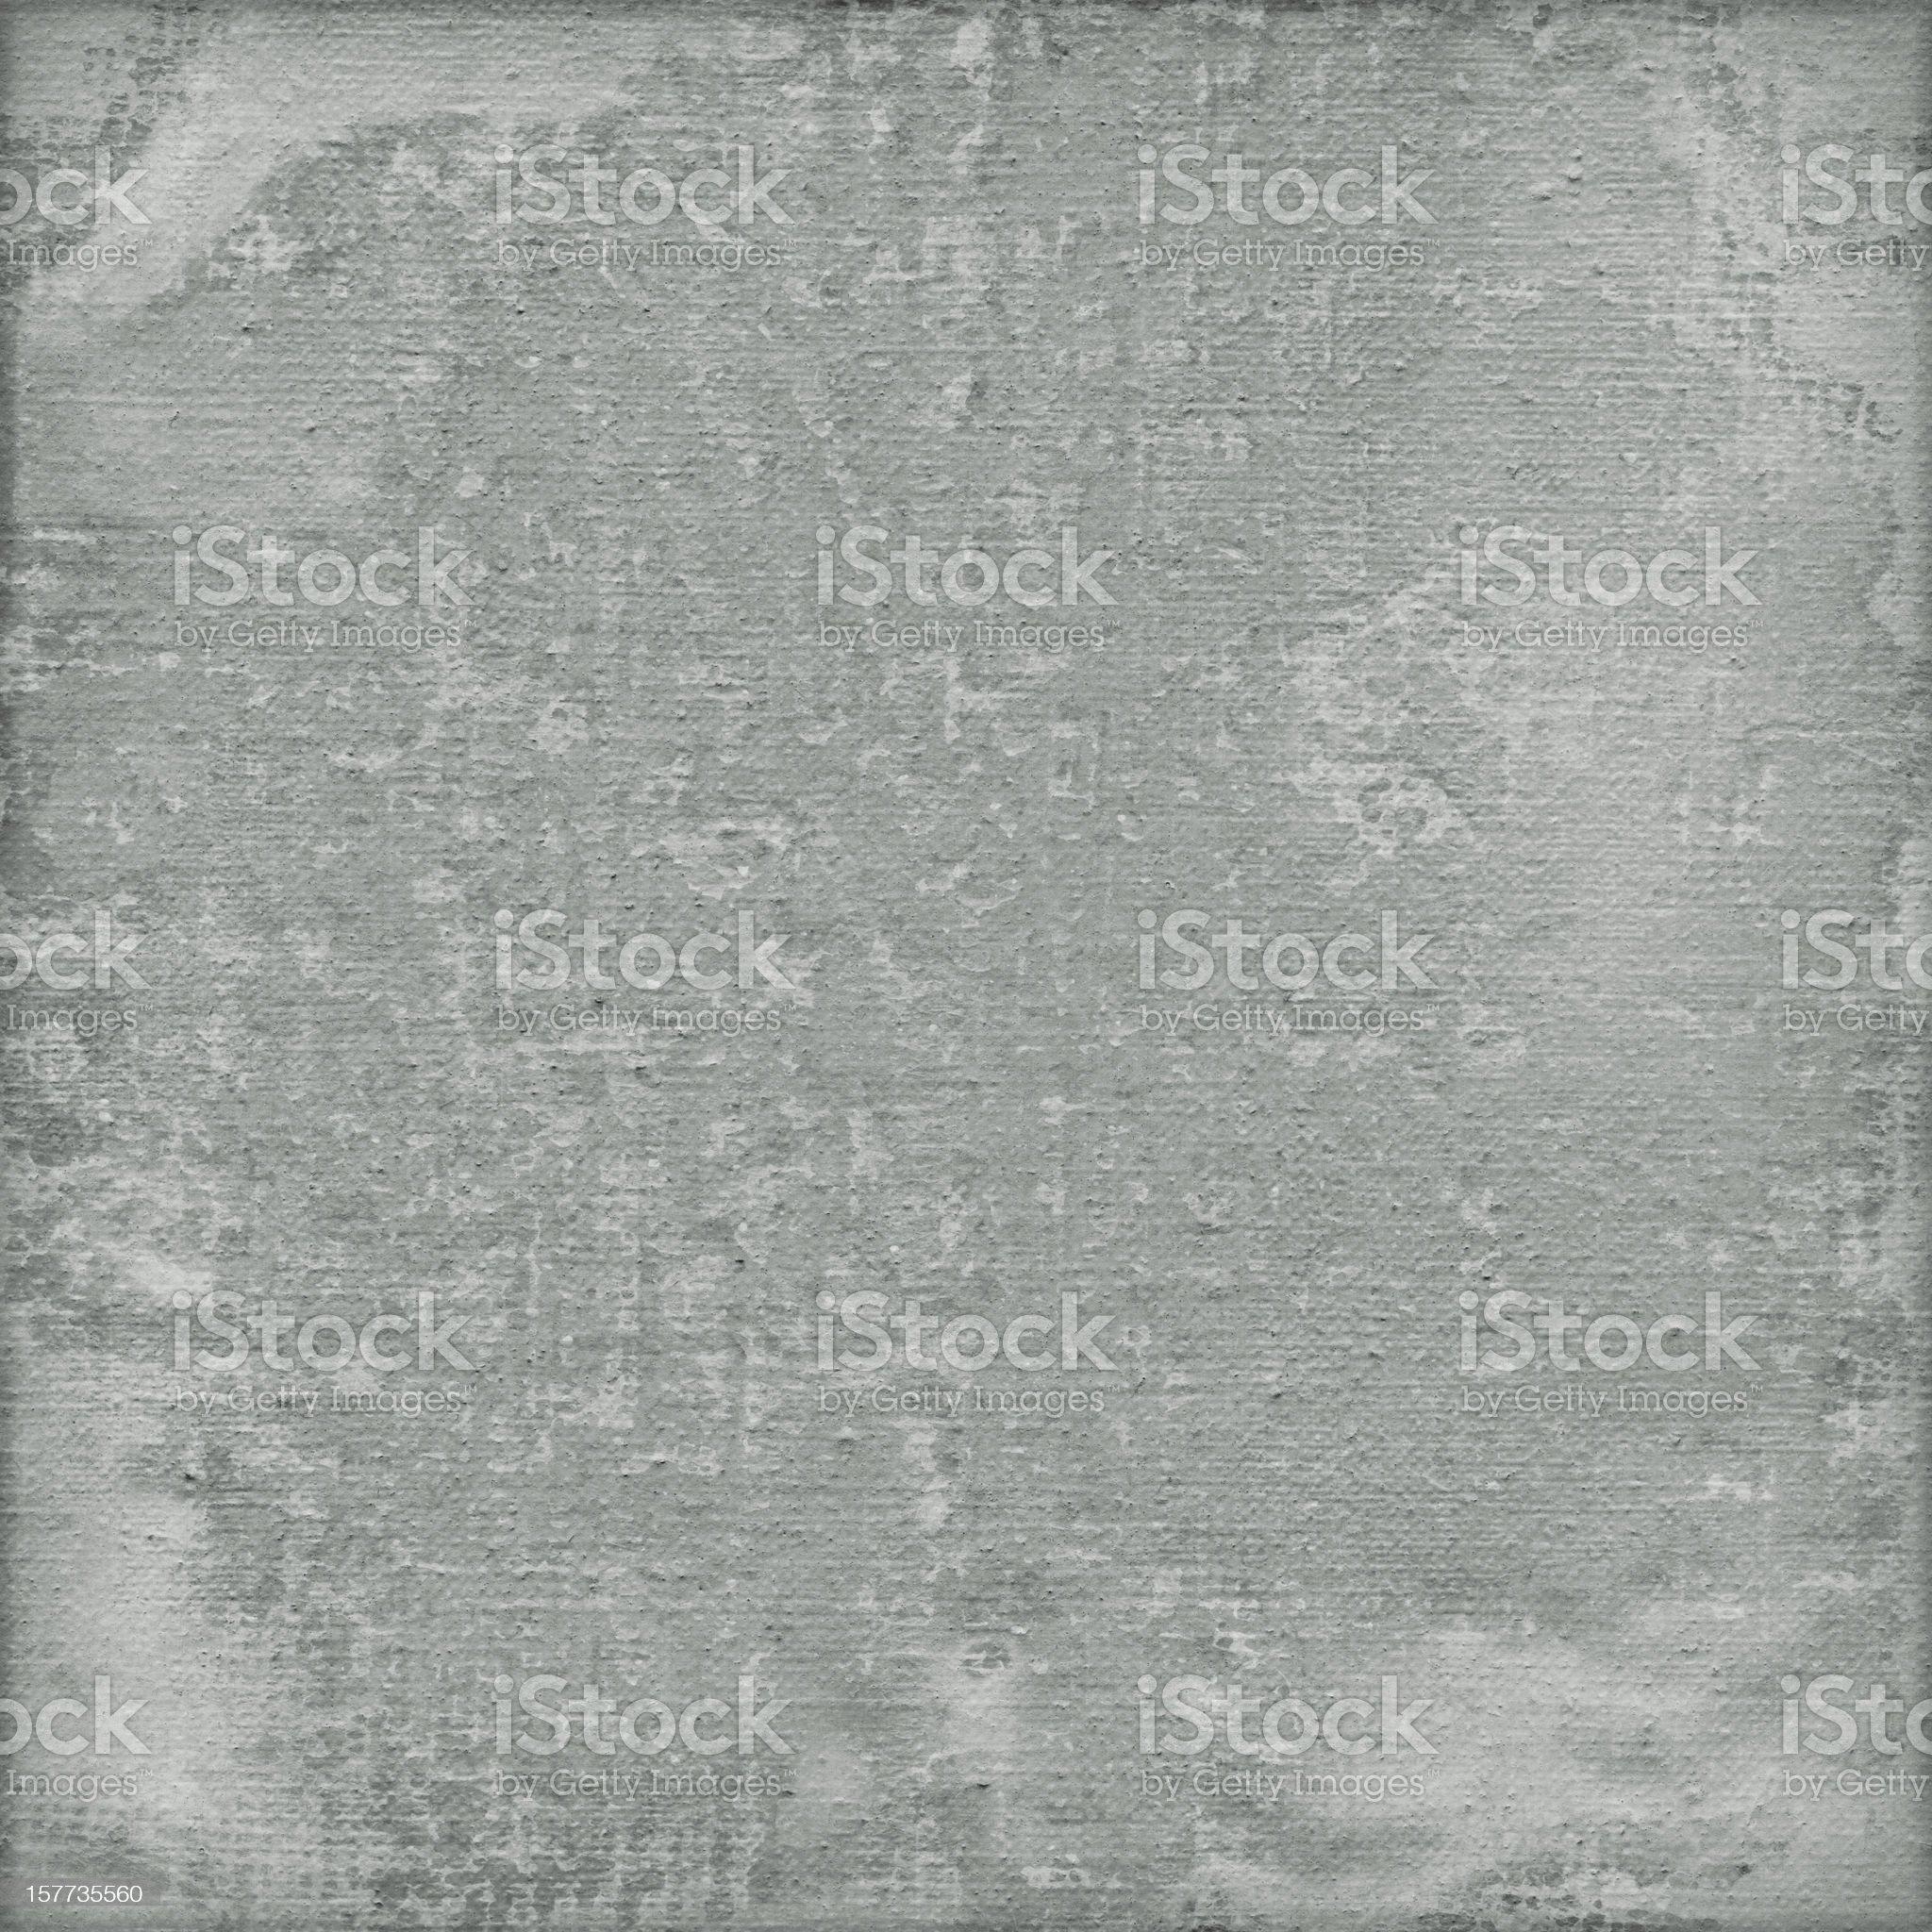 Hi-Res Antique Linen Canvas Crumpled Mottled Vignette Grunge Texture royalty-free stock photo